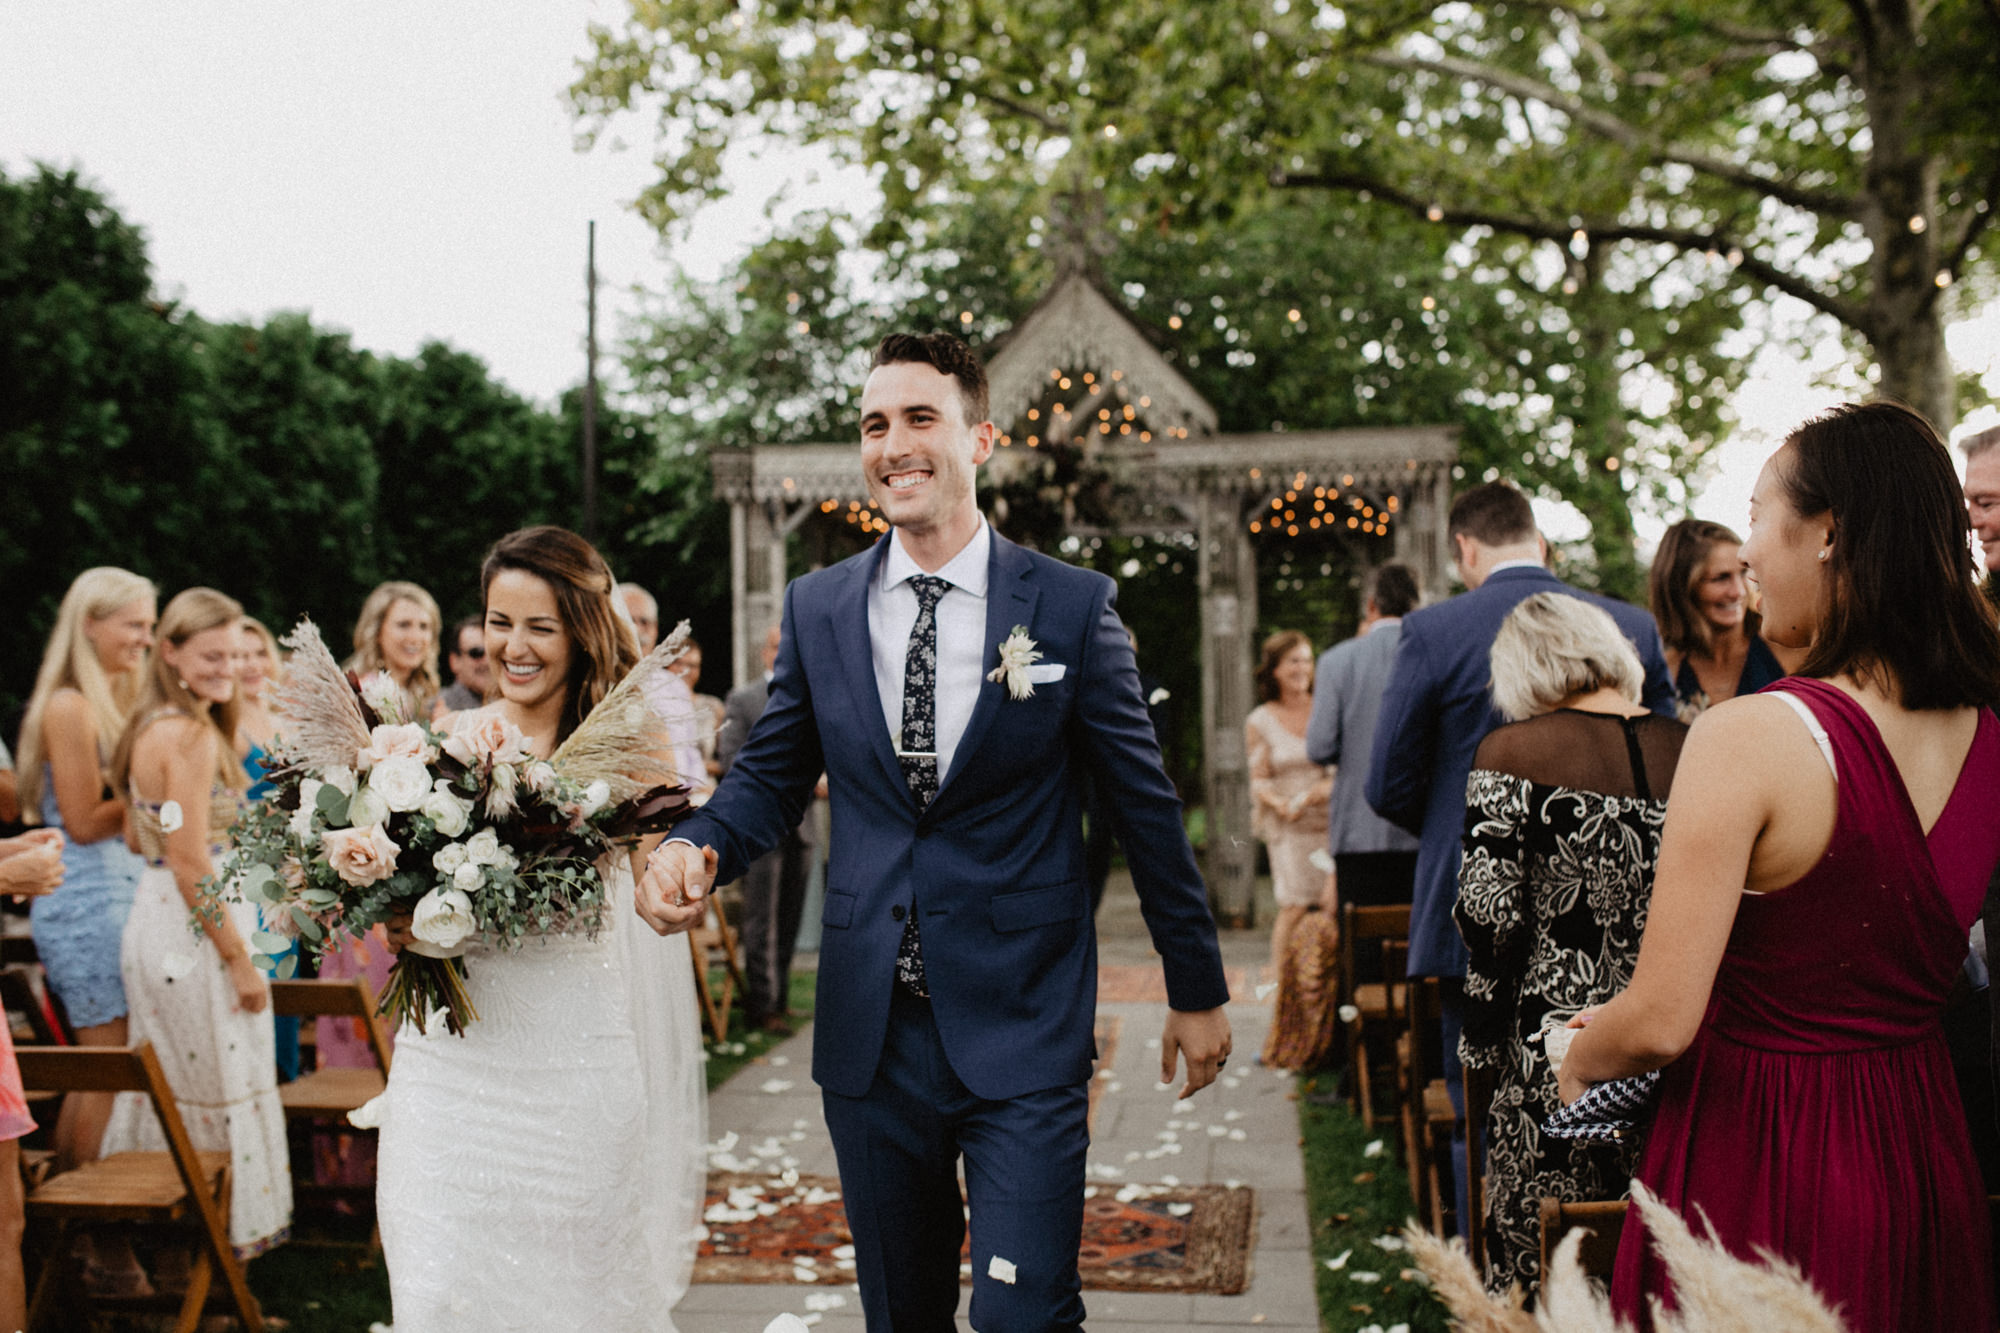 terrain-events-wedding-photographer-30.jpg